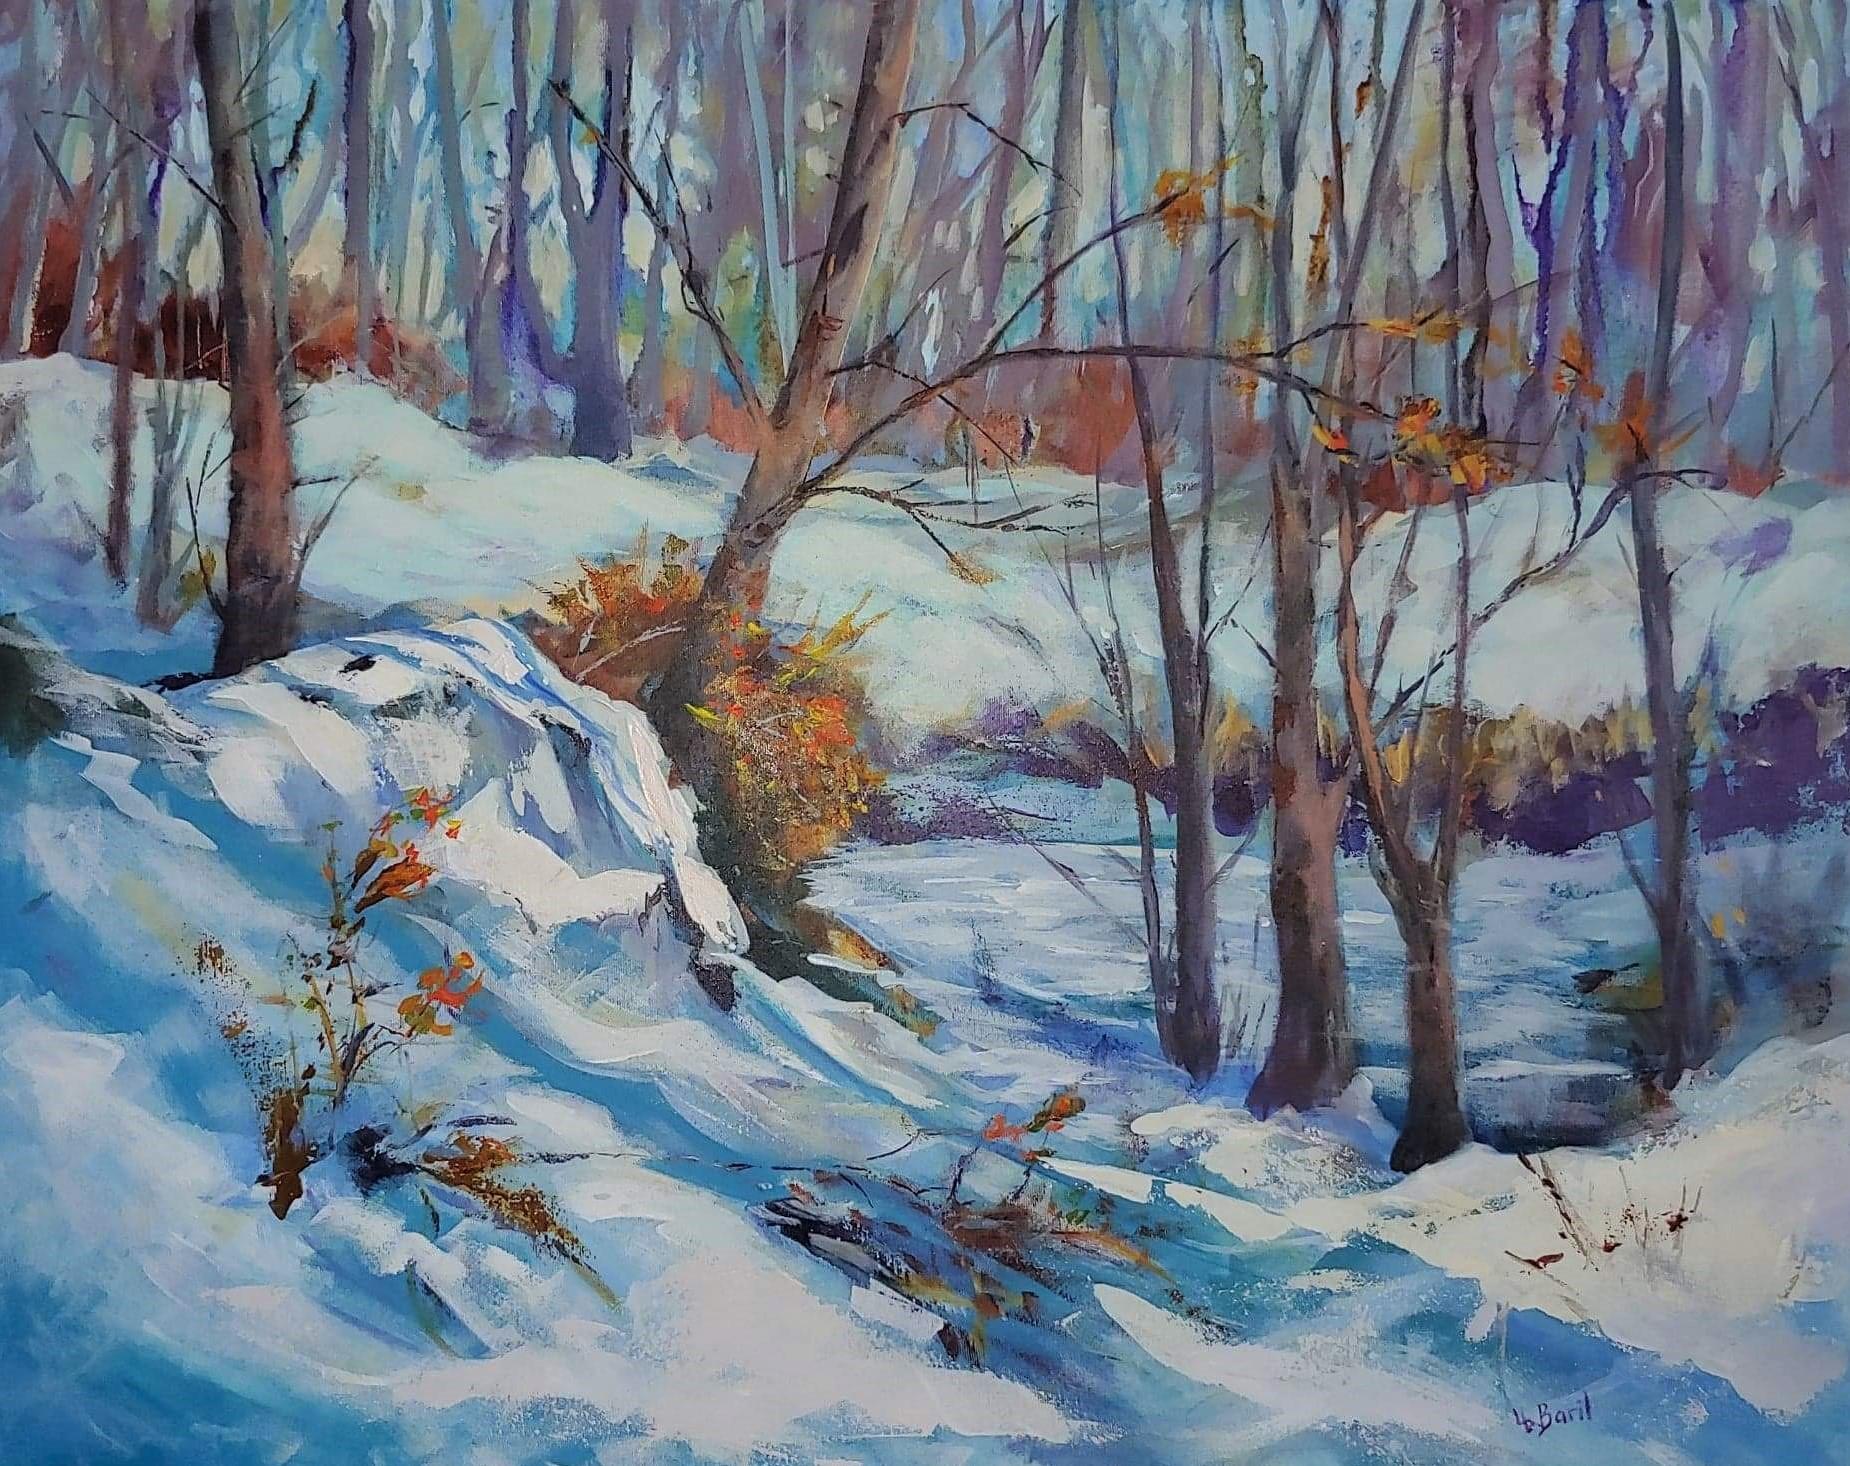 Winter near the swamp, acrylic, 24X30